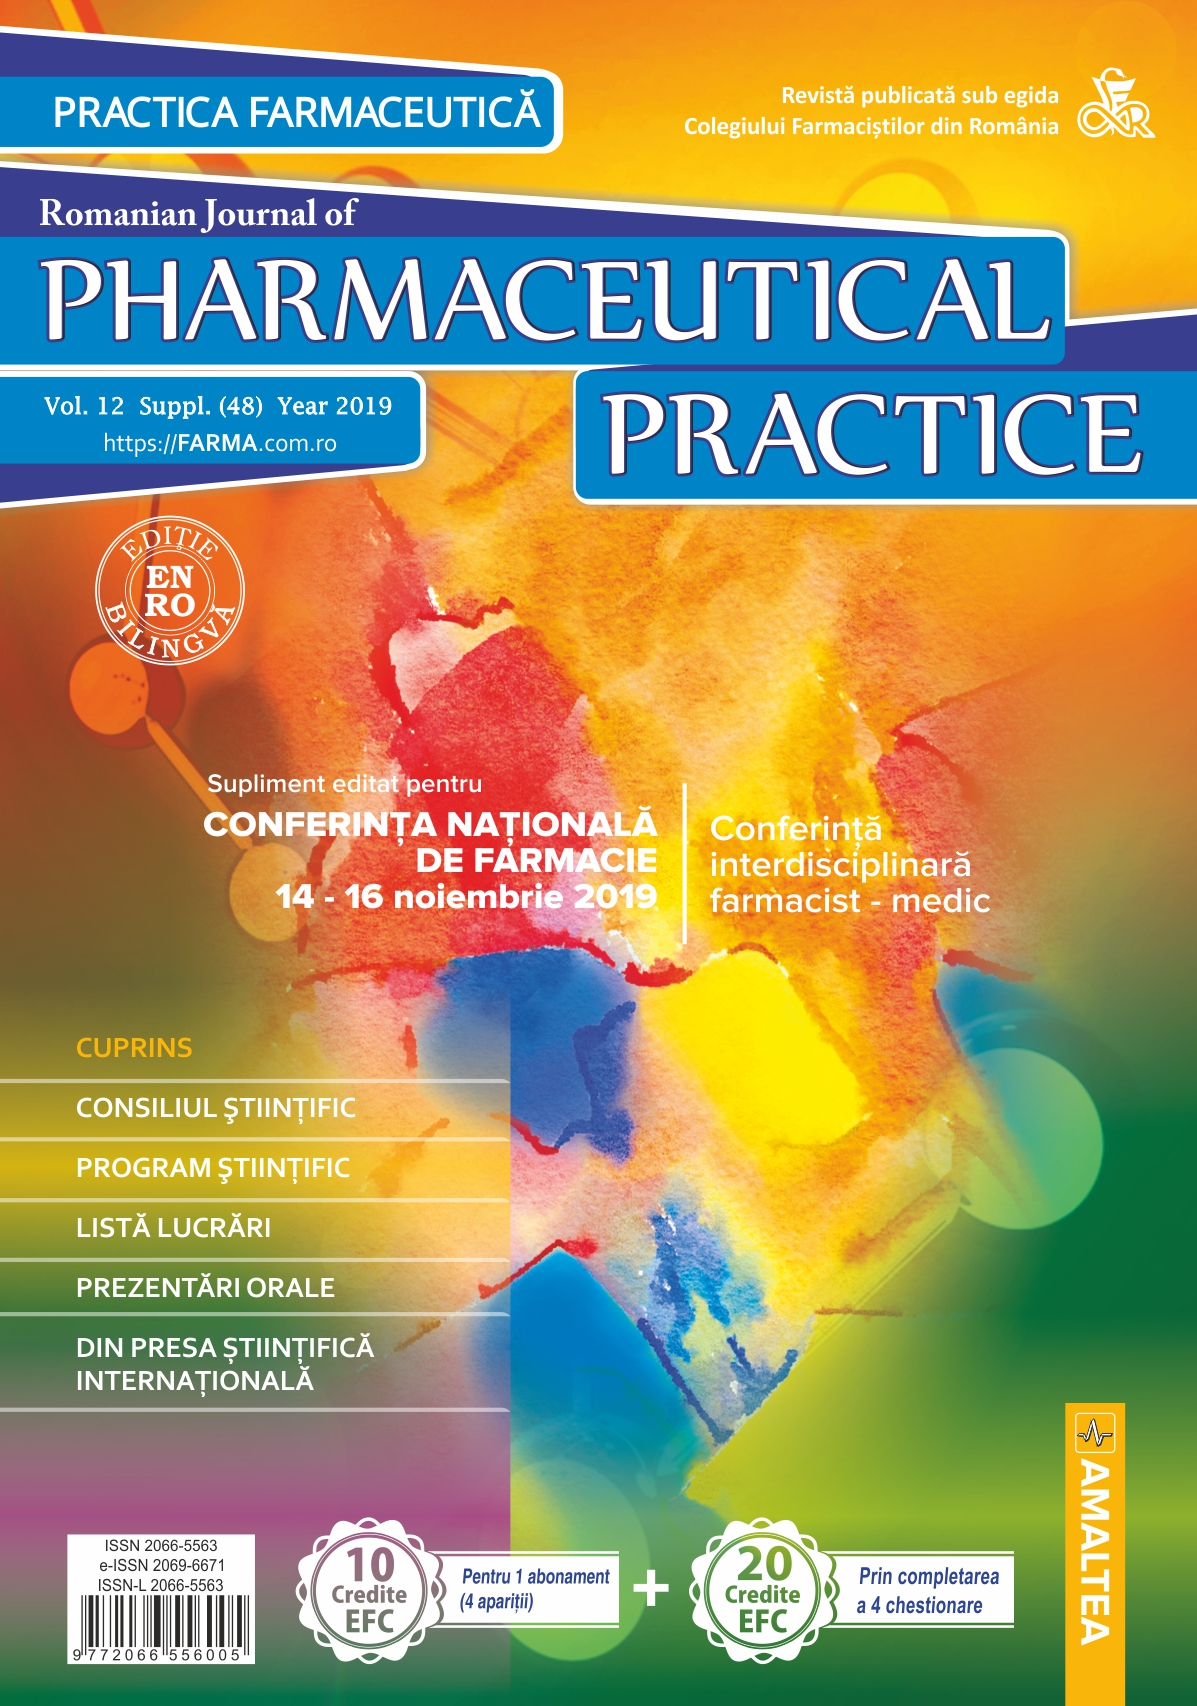 Romanian Journal of Pharmaceutical Practice - Practica Farmaceutica, Vol. 12, Suppl. (48), 2019